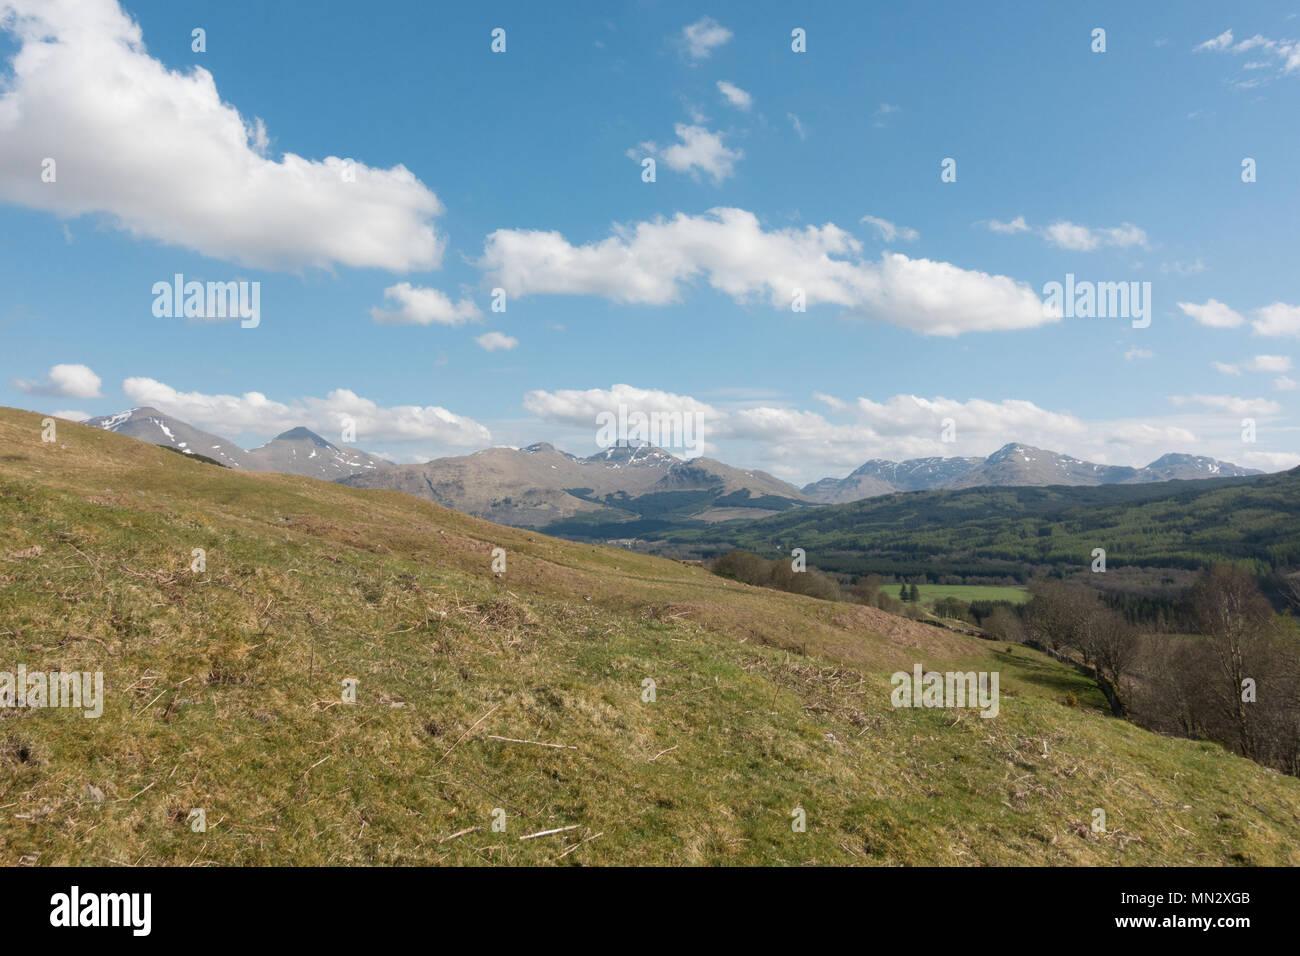 Crianlarich Hills, from Tyndrum, Scotland, UK  - with munros from left to right Ben More, Stob Binnein, Cruach Ardrain - Stock Image